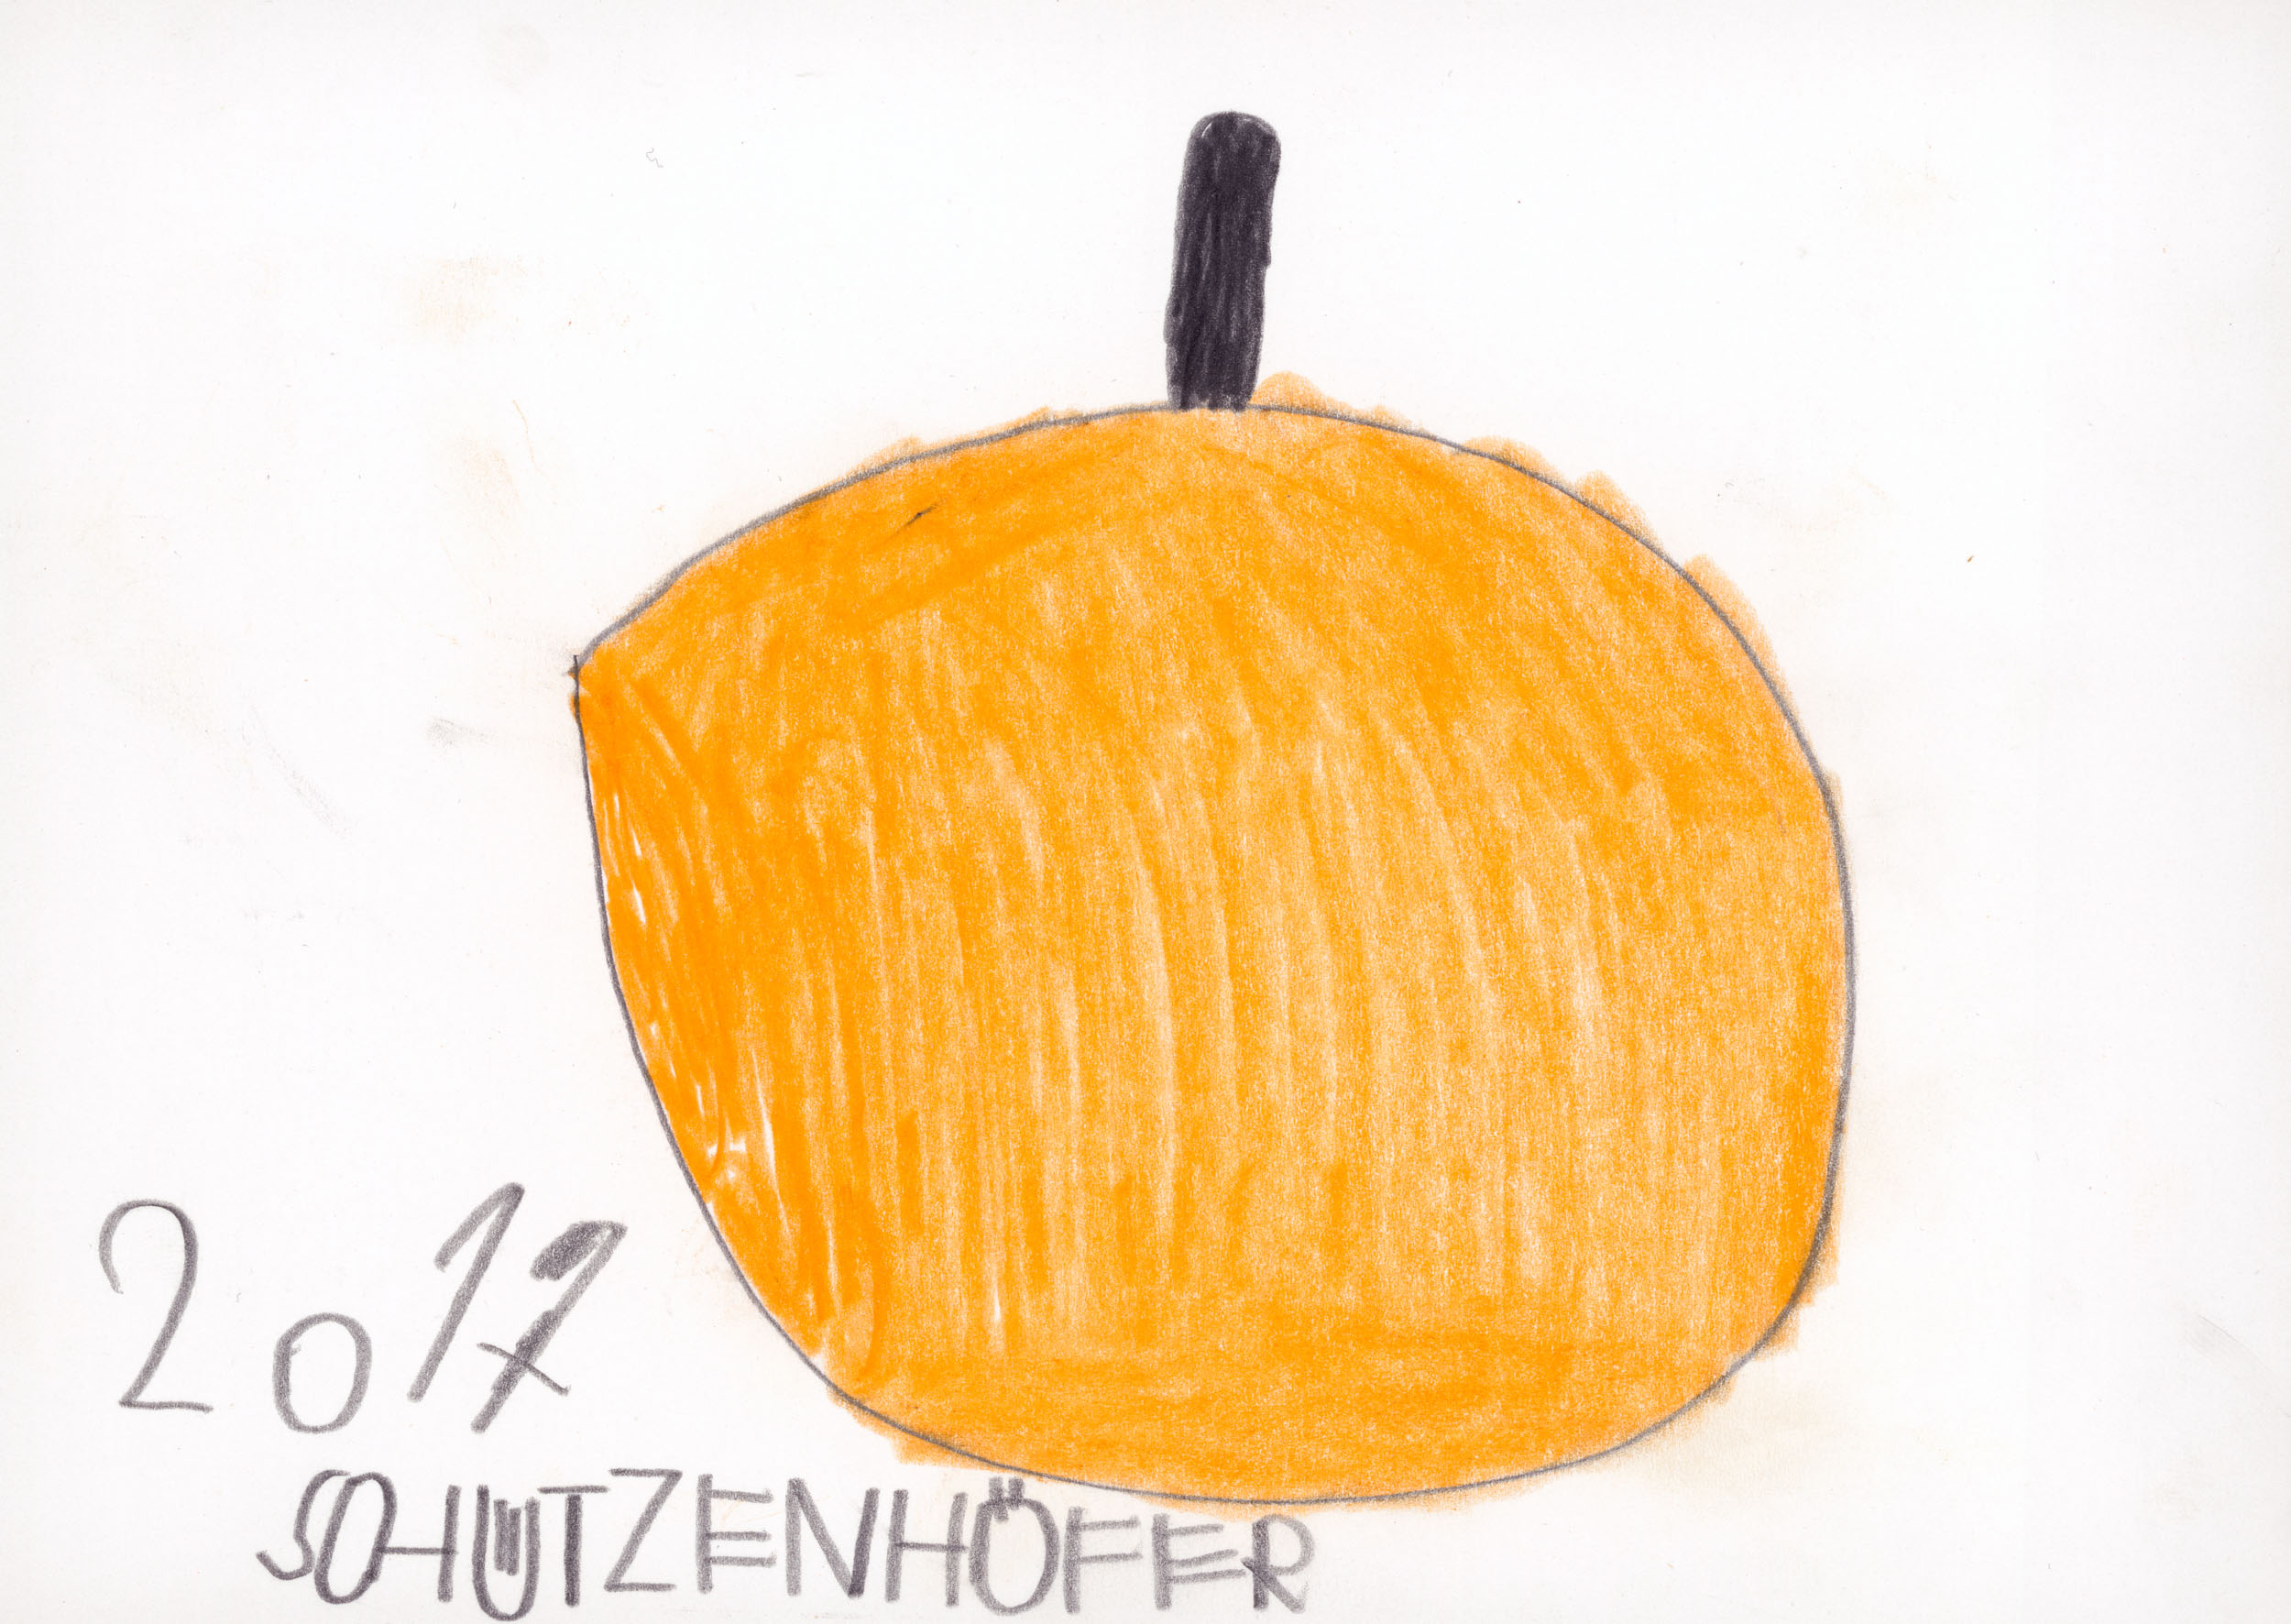 schützenhöfer günther - apfel / apple